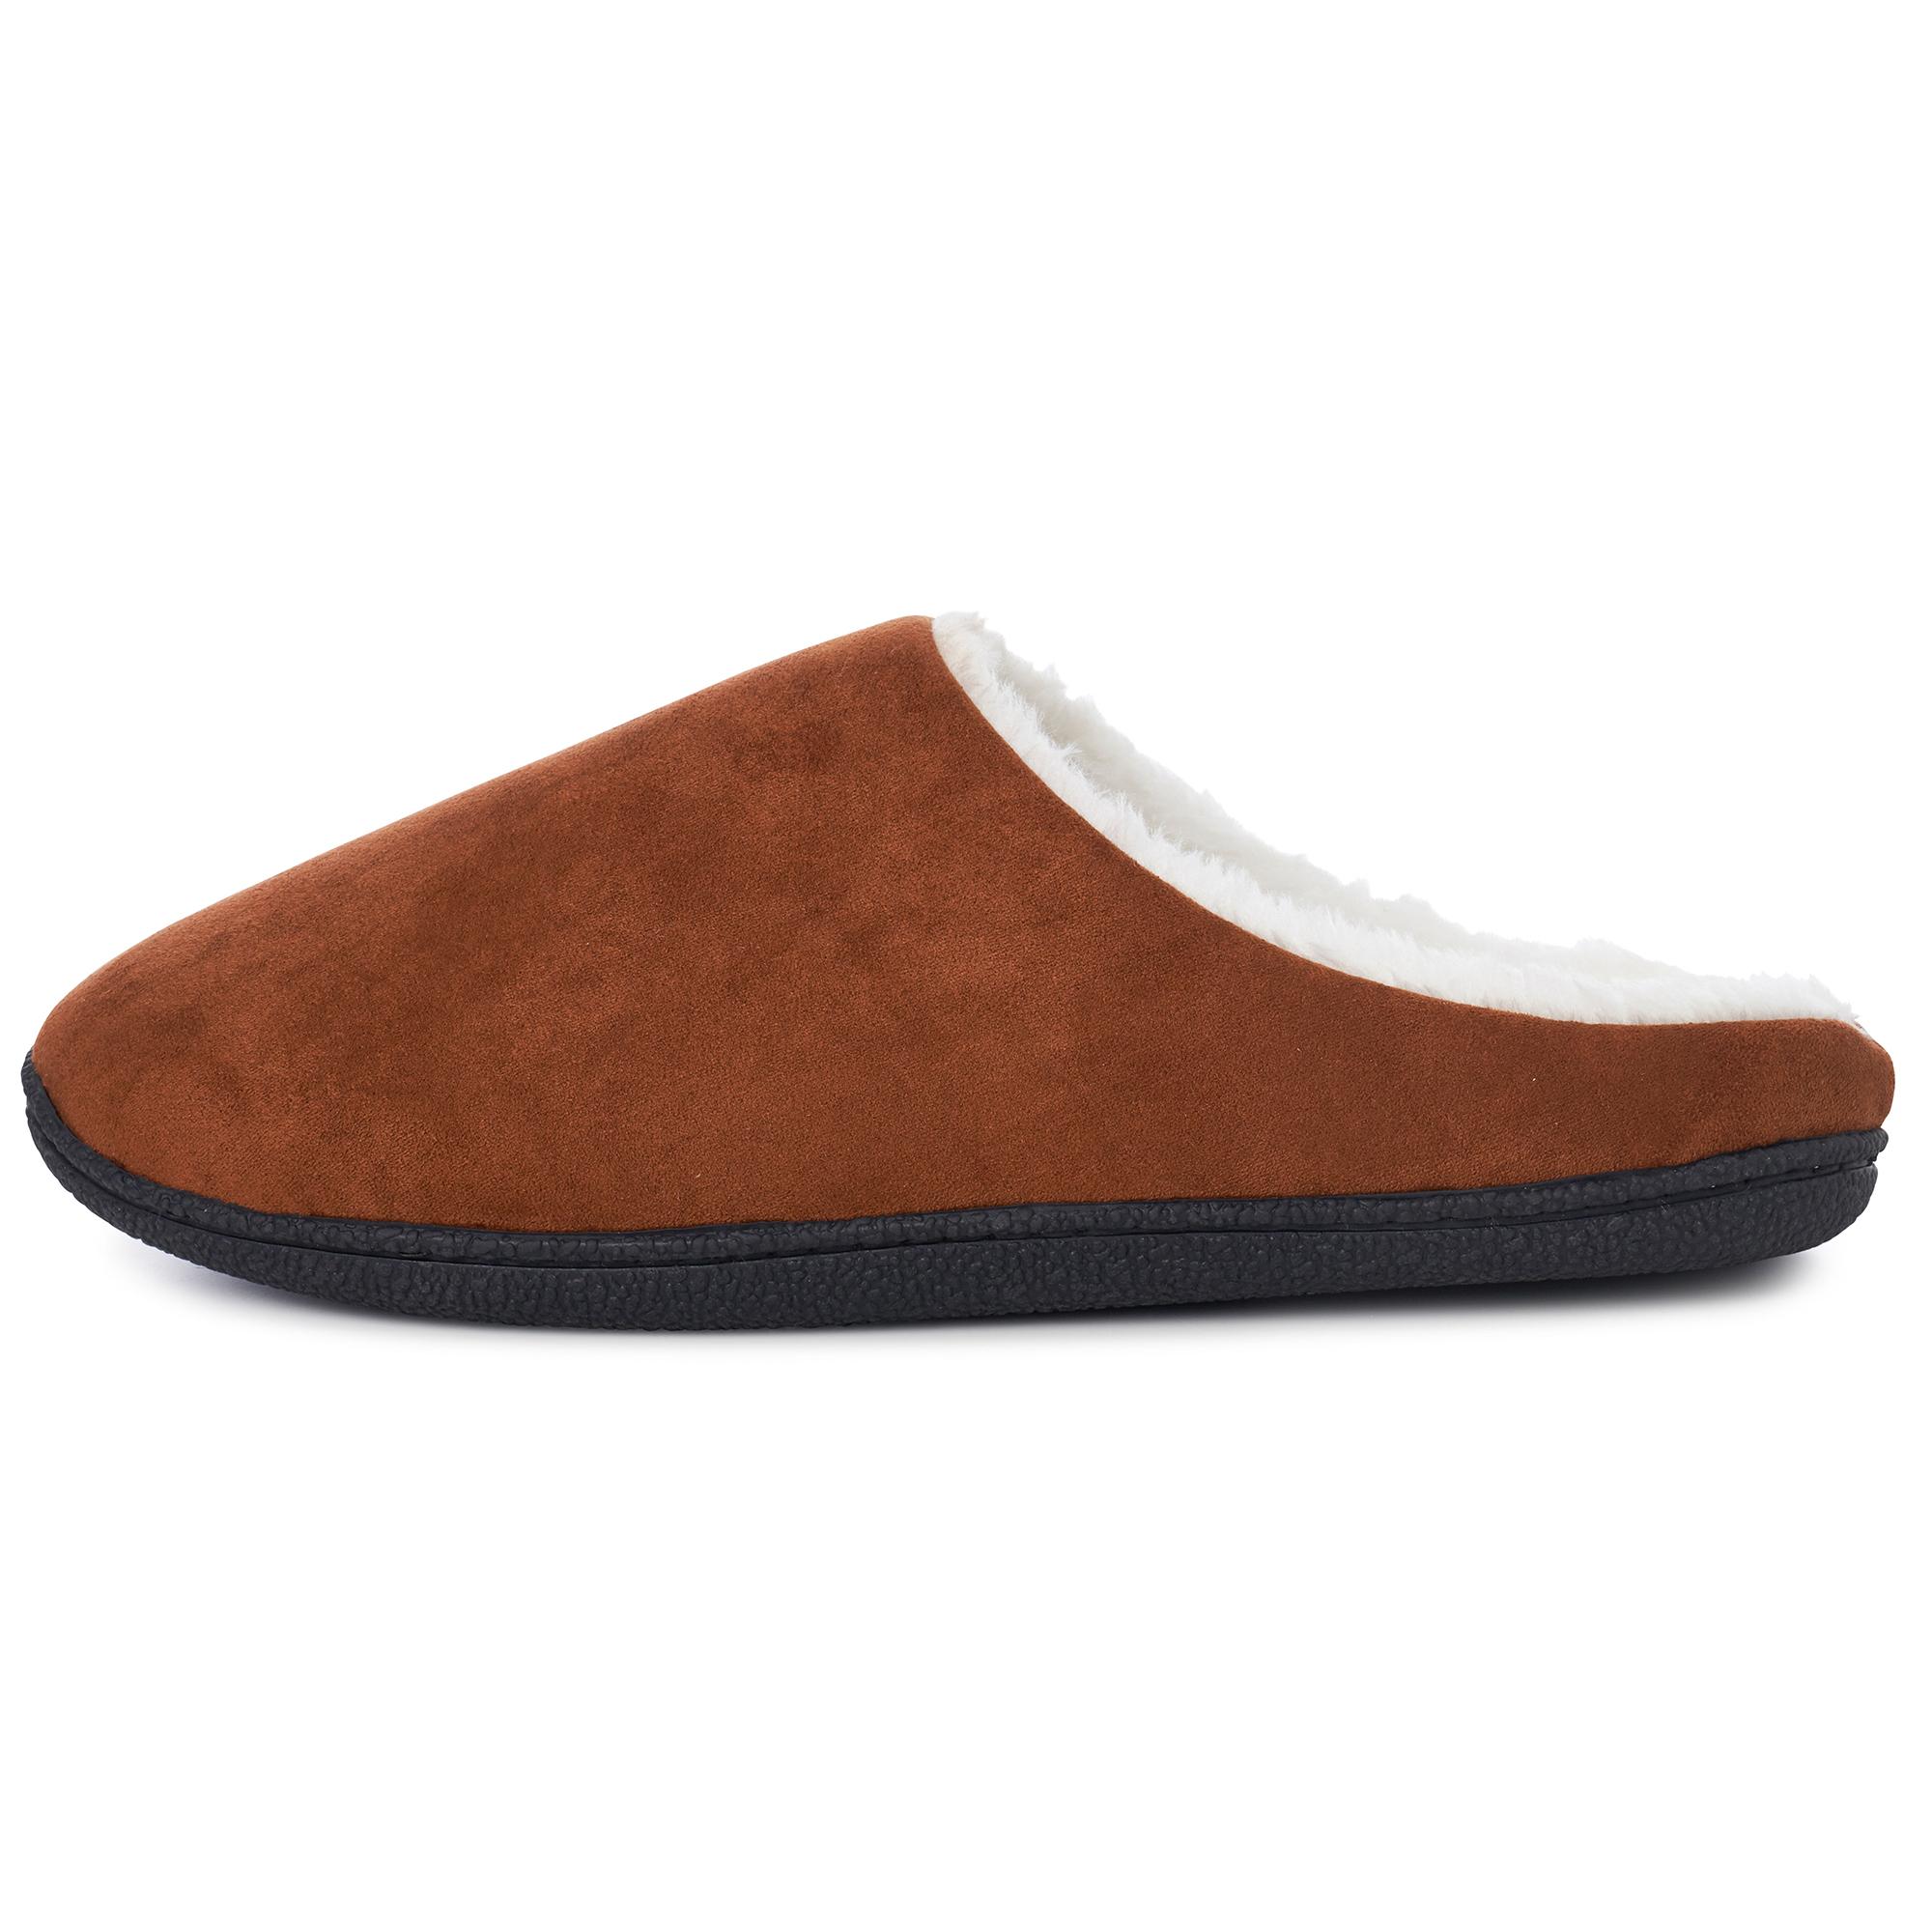 Alpine-Swiss-Mens-Memory-Foam-Clog-Slippers-Indoor-Comfort-Slip-On-House-Shoes thumbnail 19